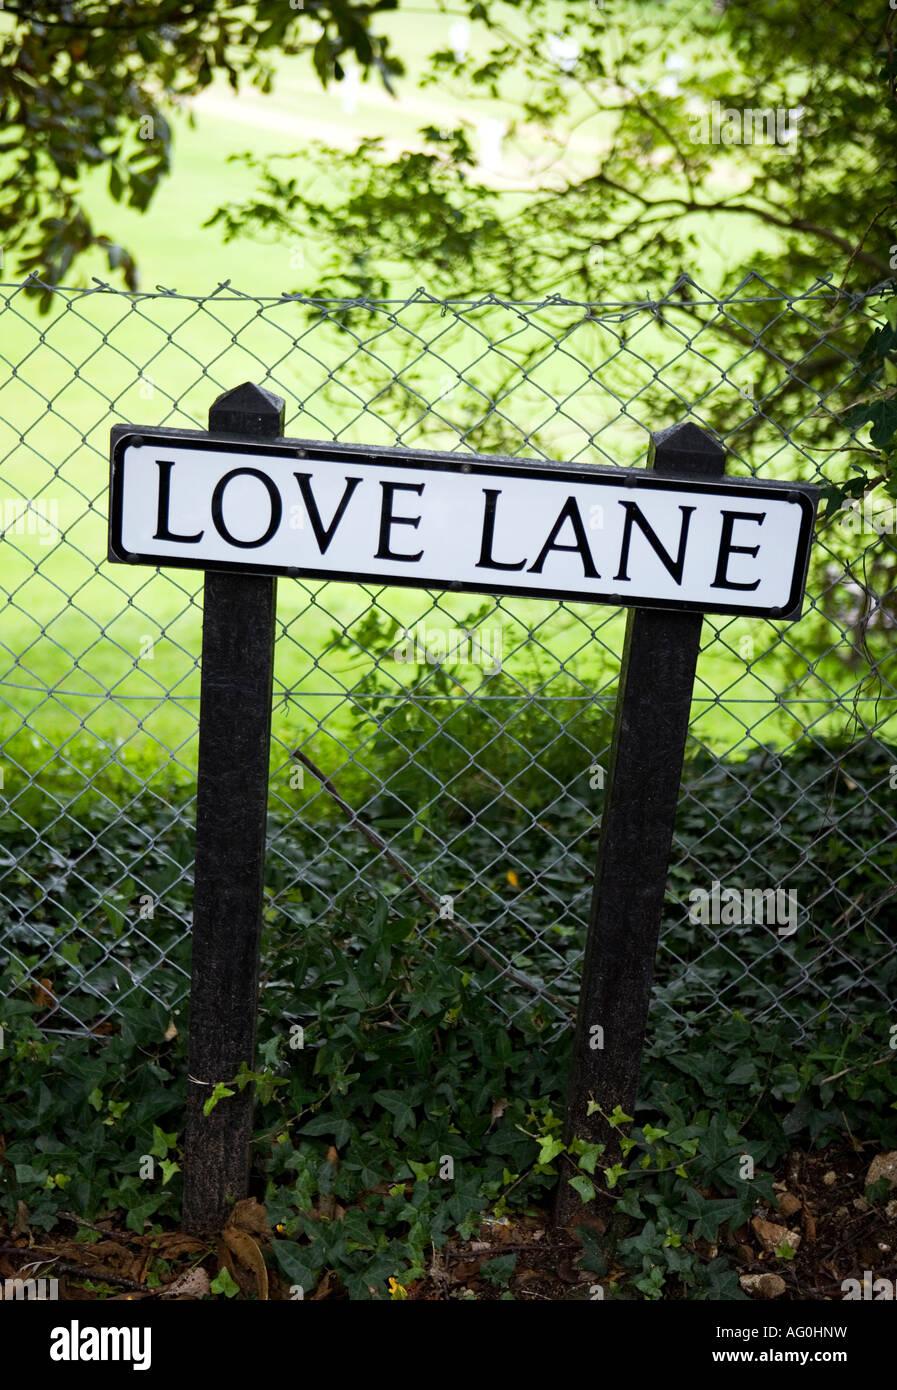 Road sign 'Love lane' - Stock Image